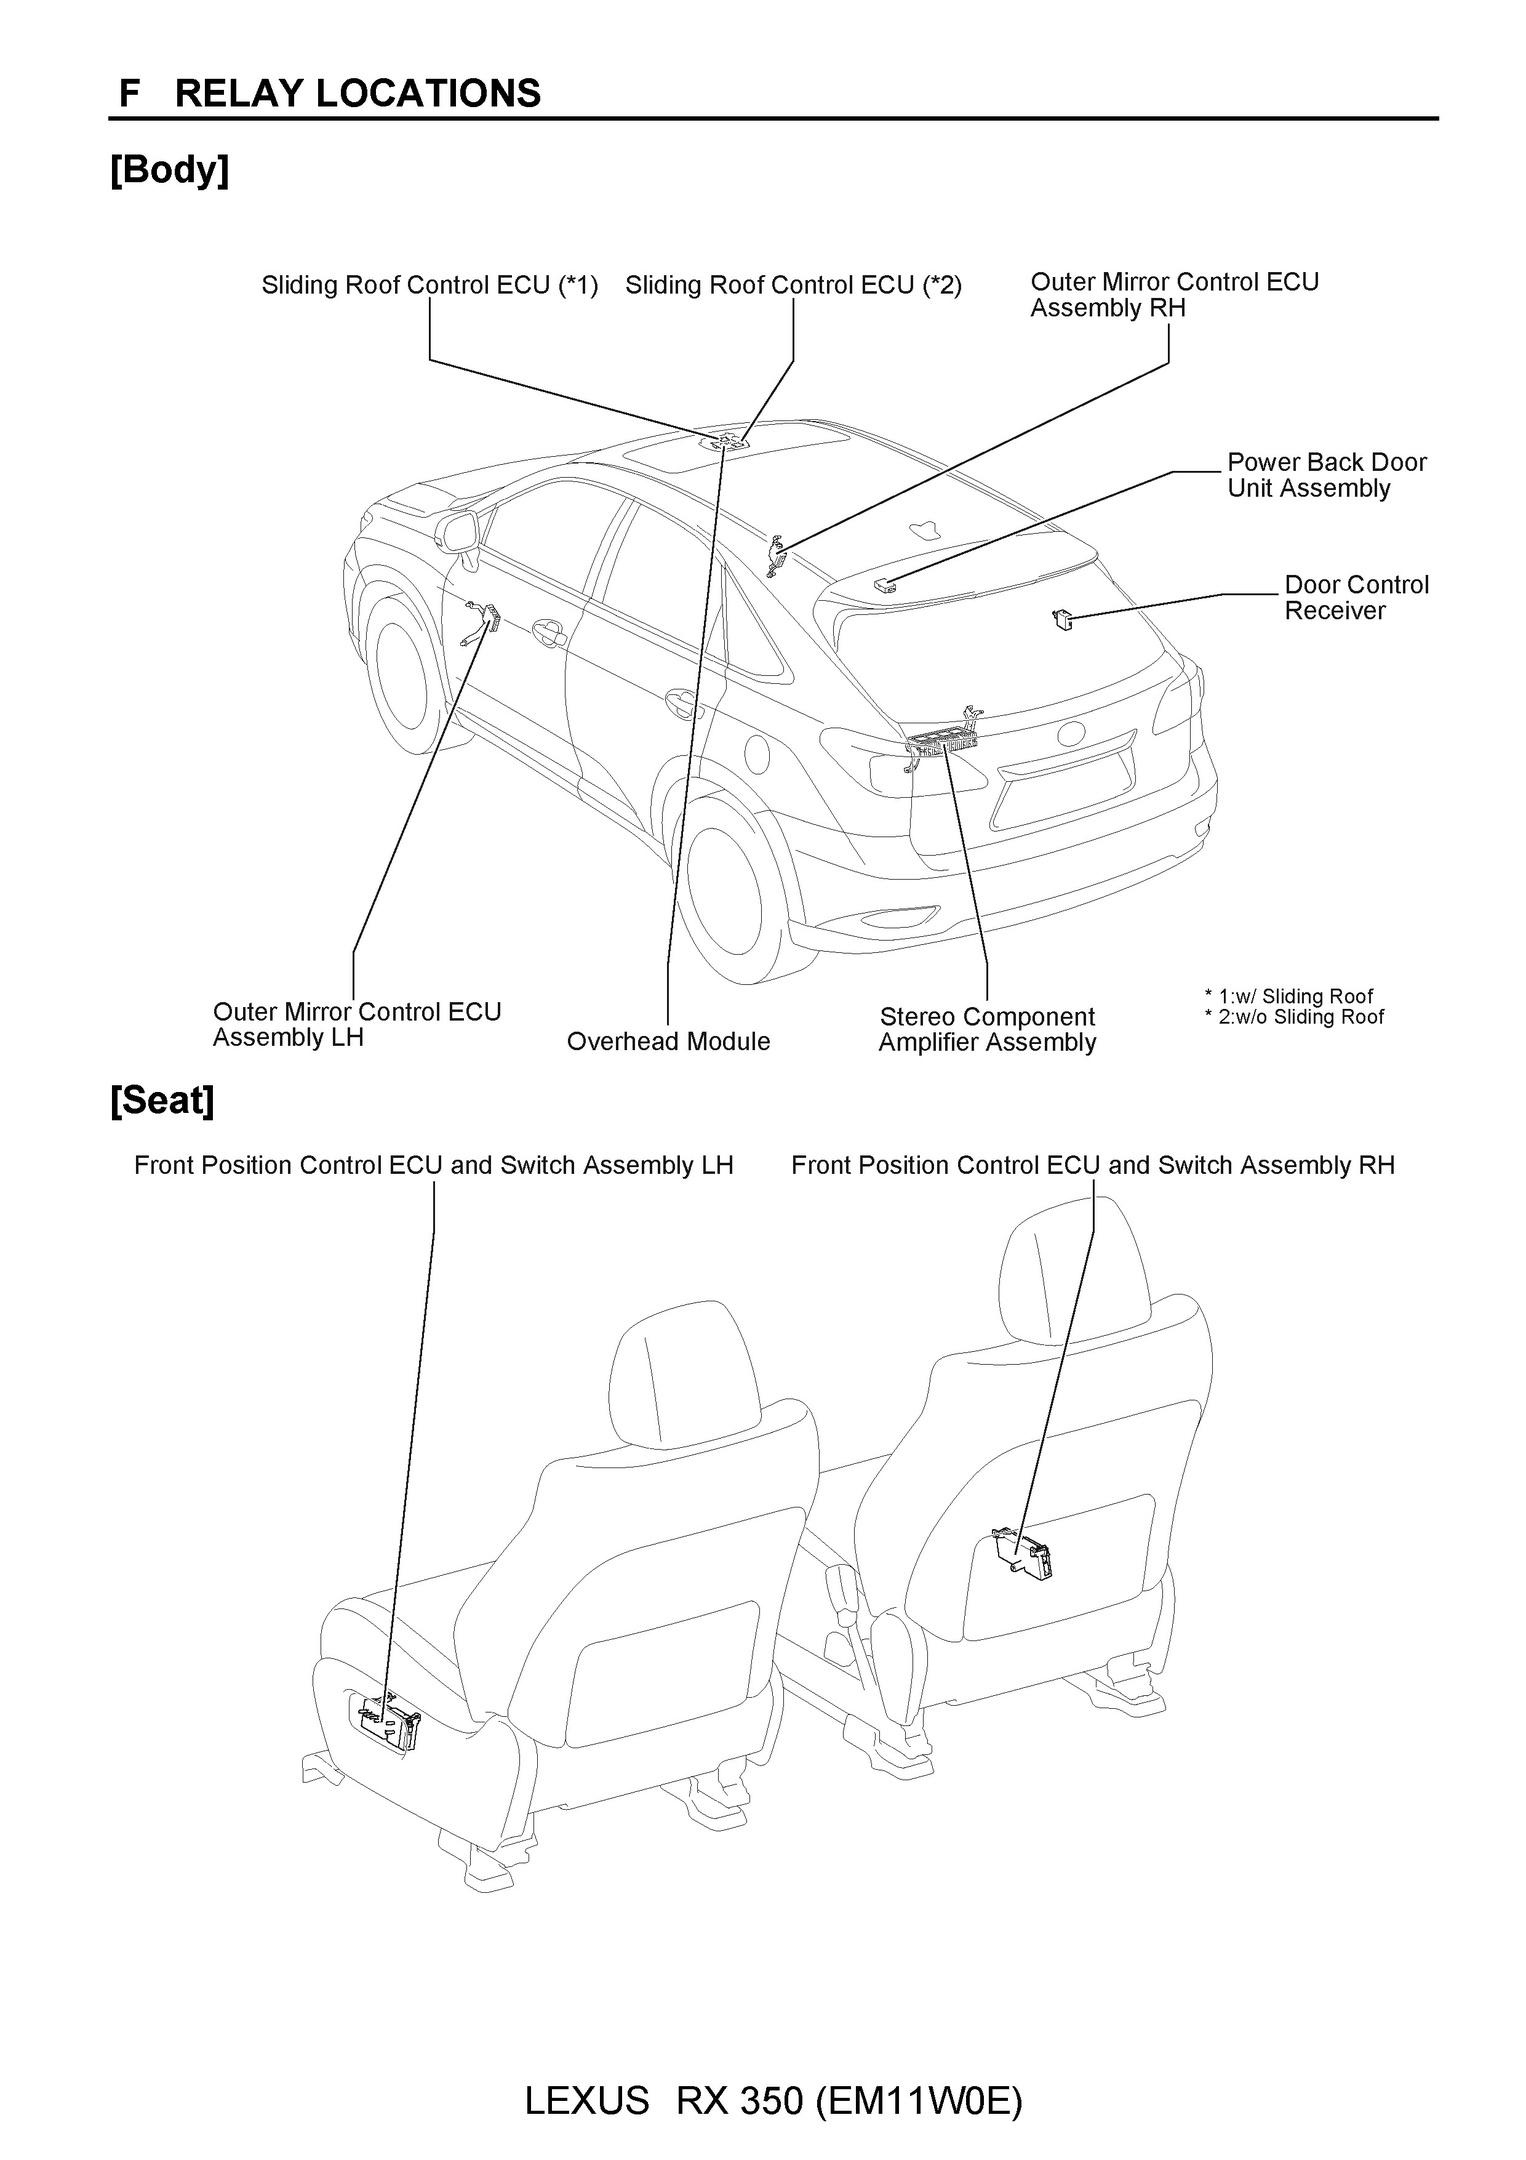 hight resolution of free 2010 lexus rx350 oem electrical wiring diagram oem auto lexus rx 350 radio wiring diagram lexus rx350 wiring diagram